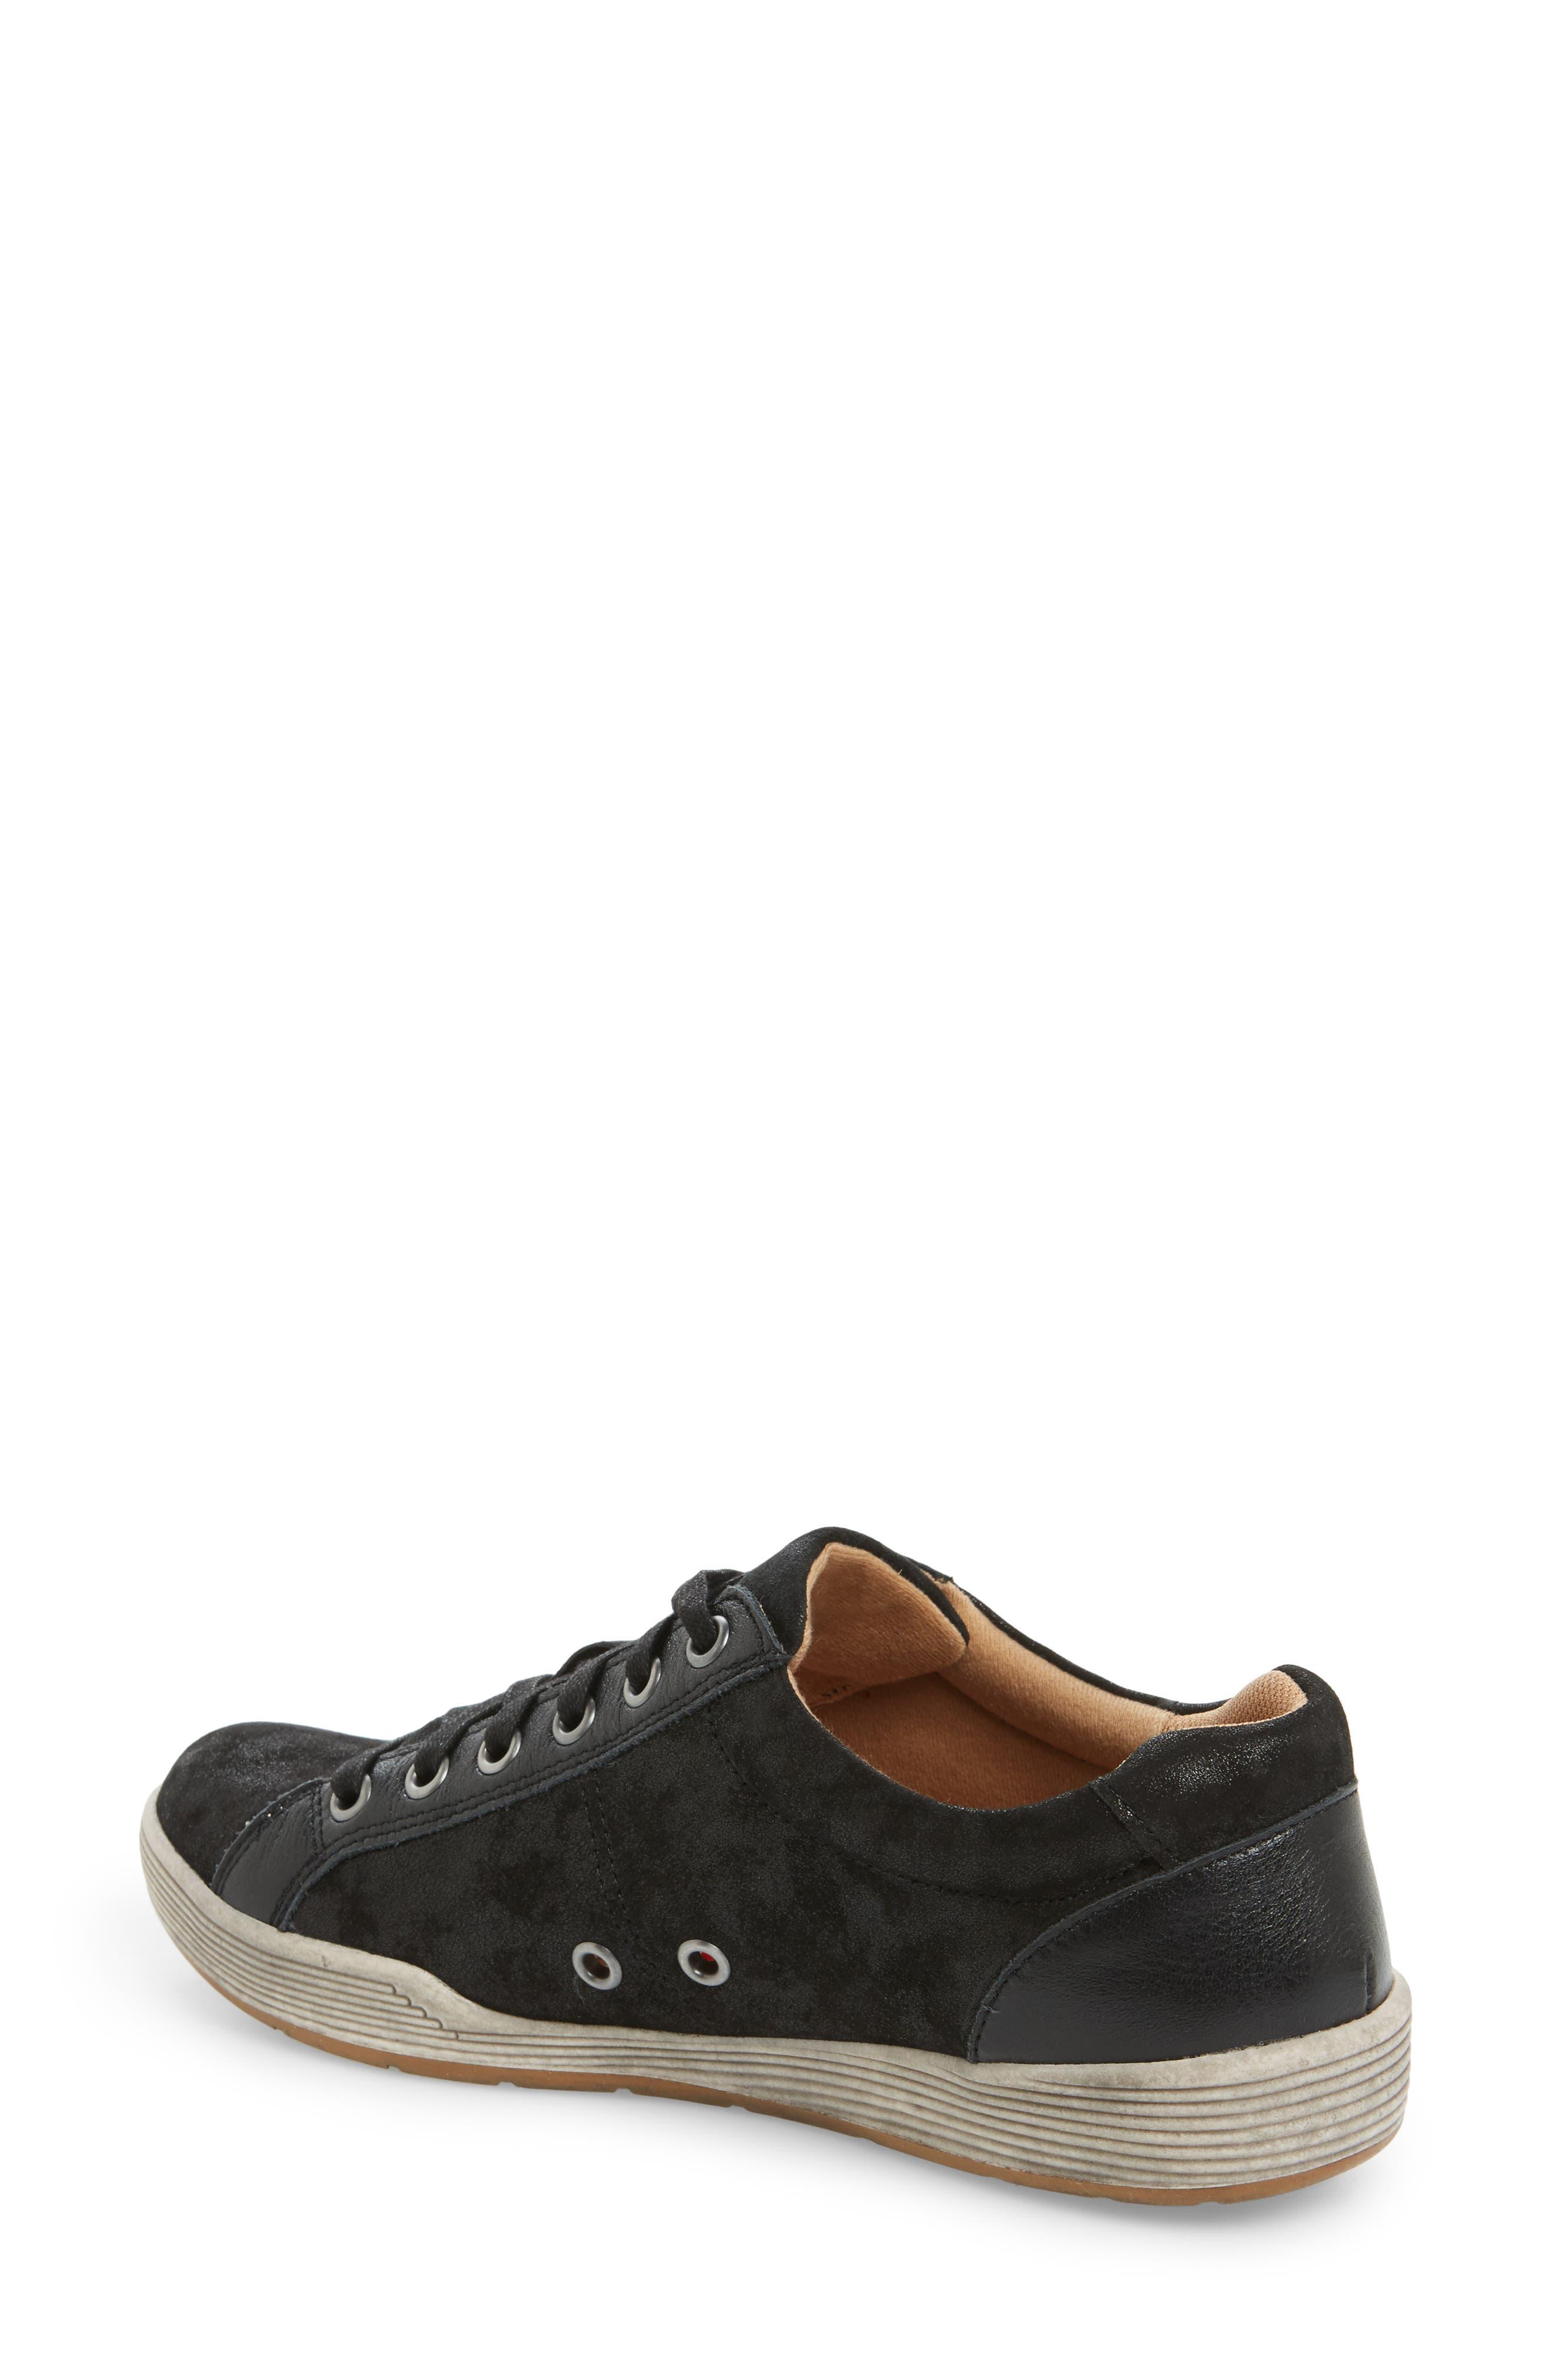 Lyons Low-Top Sneaker,                             Alternate thumbnail 2, color,                             BLACK SUEDE